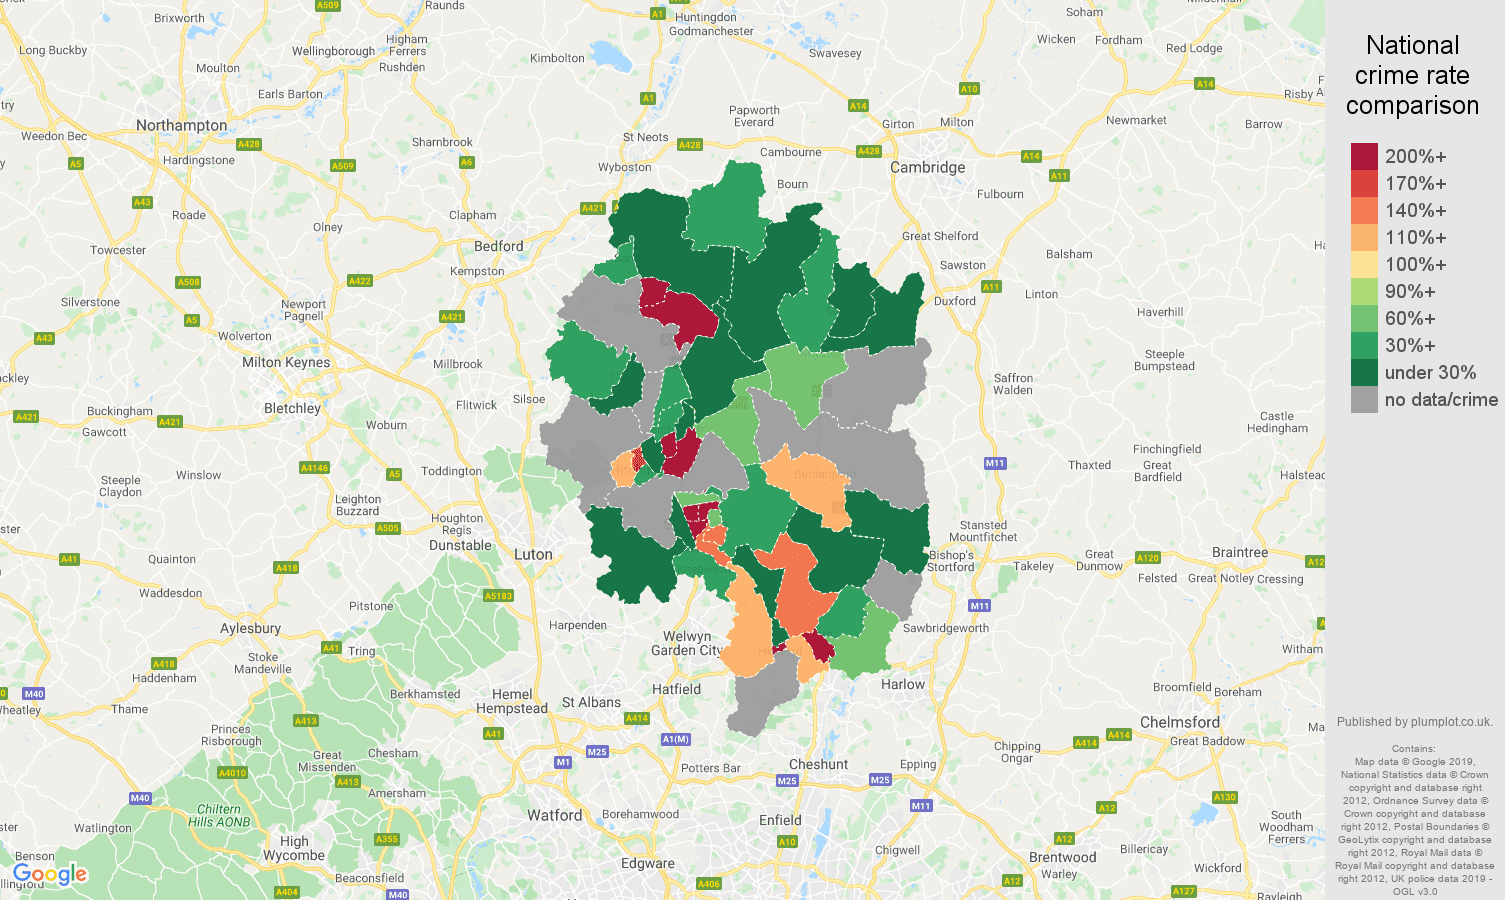 Stevenage shoplifting crime rate comparison map